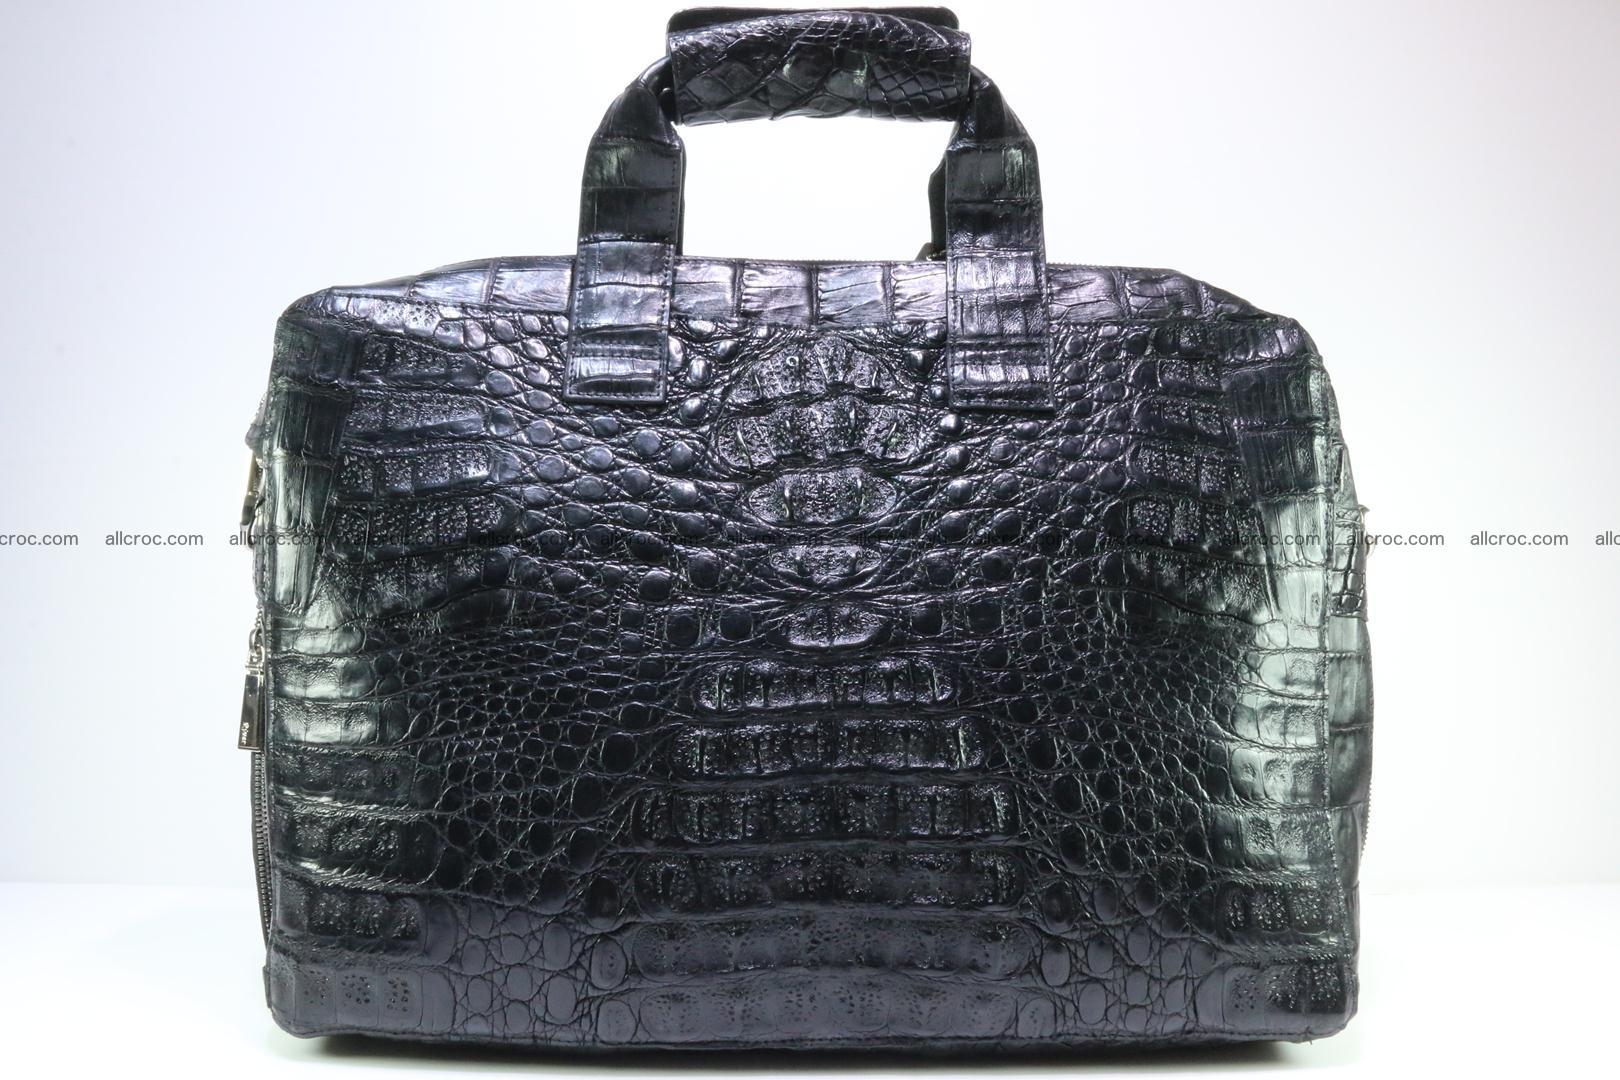 Crocodile skin handbag 127 Foto 0